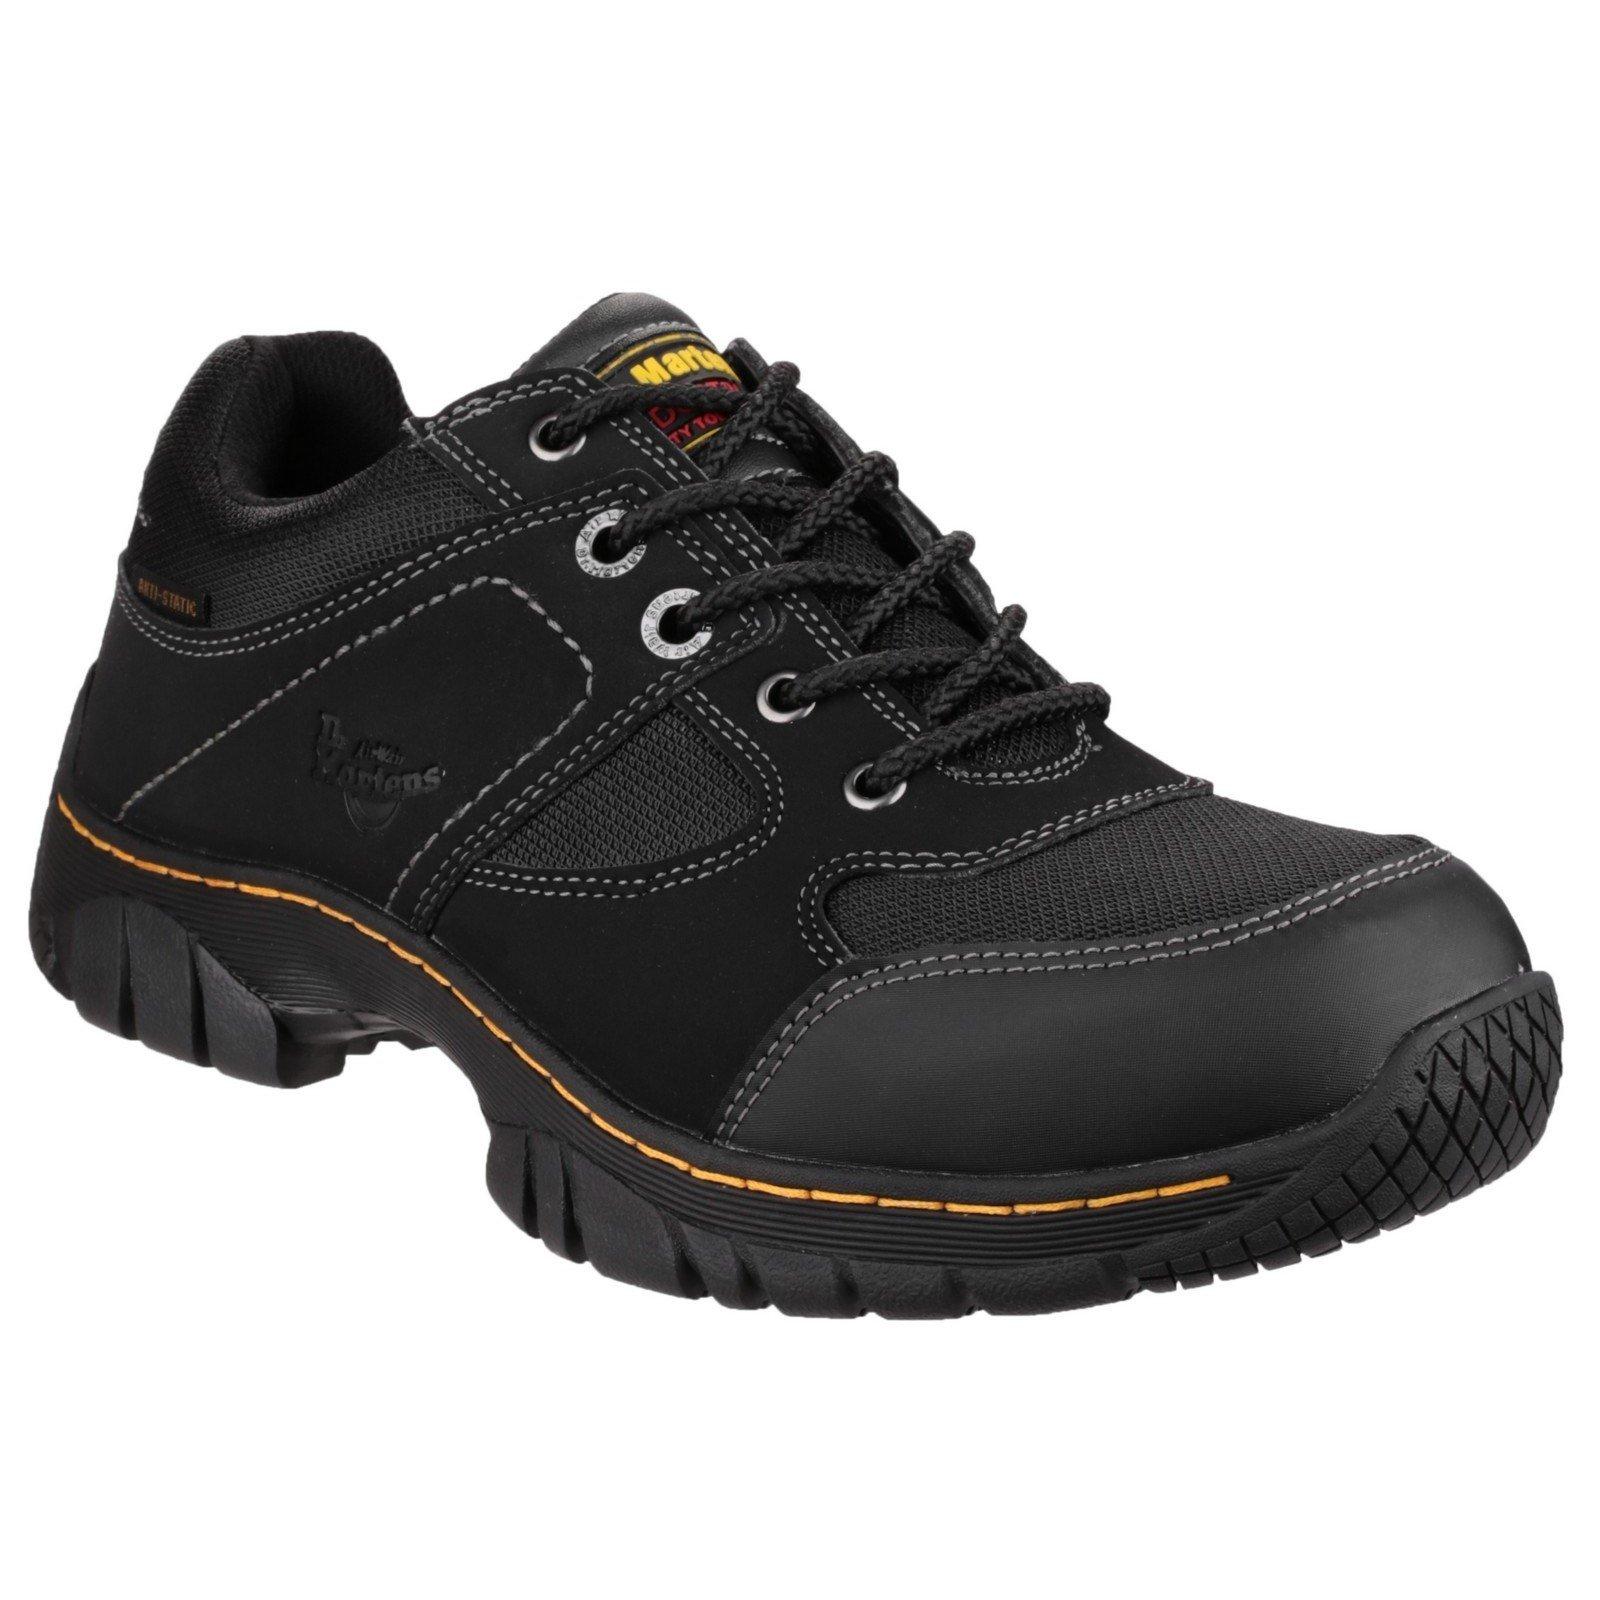 Dr Martens Unisex Gunaldo Safety Trainer Black 21648 - Black 11